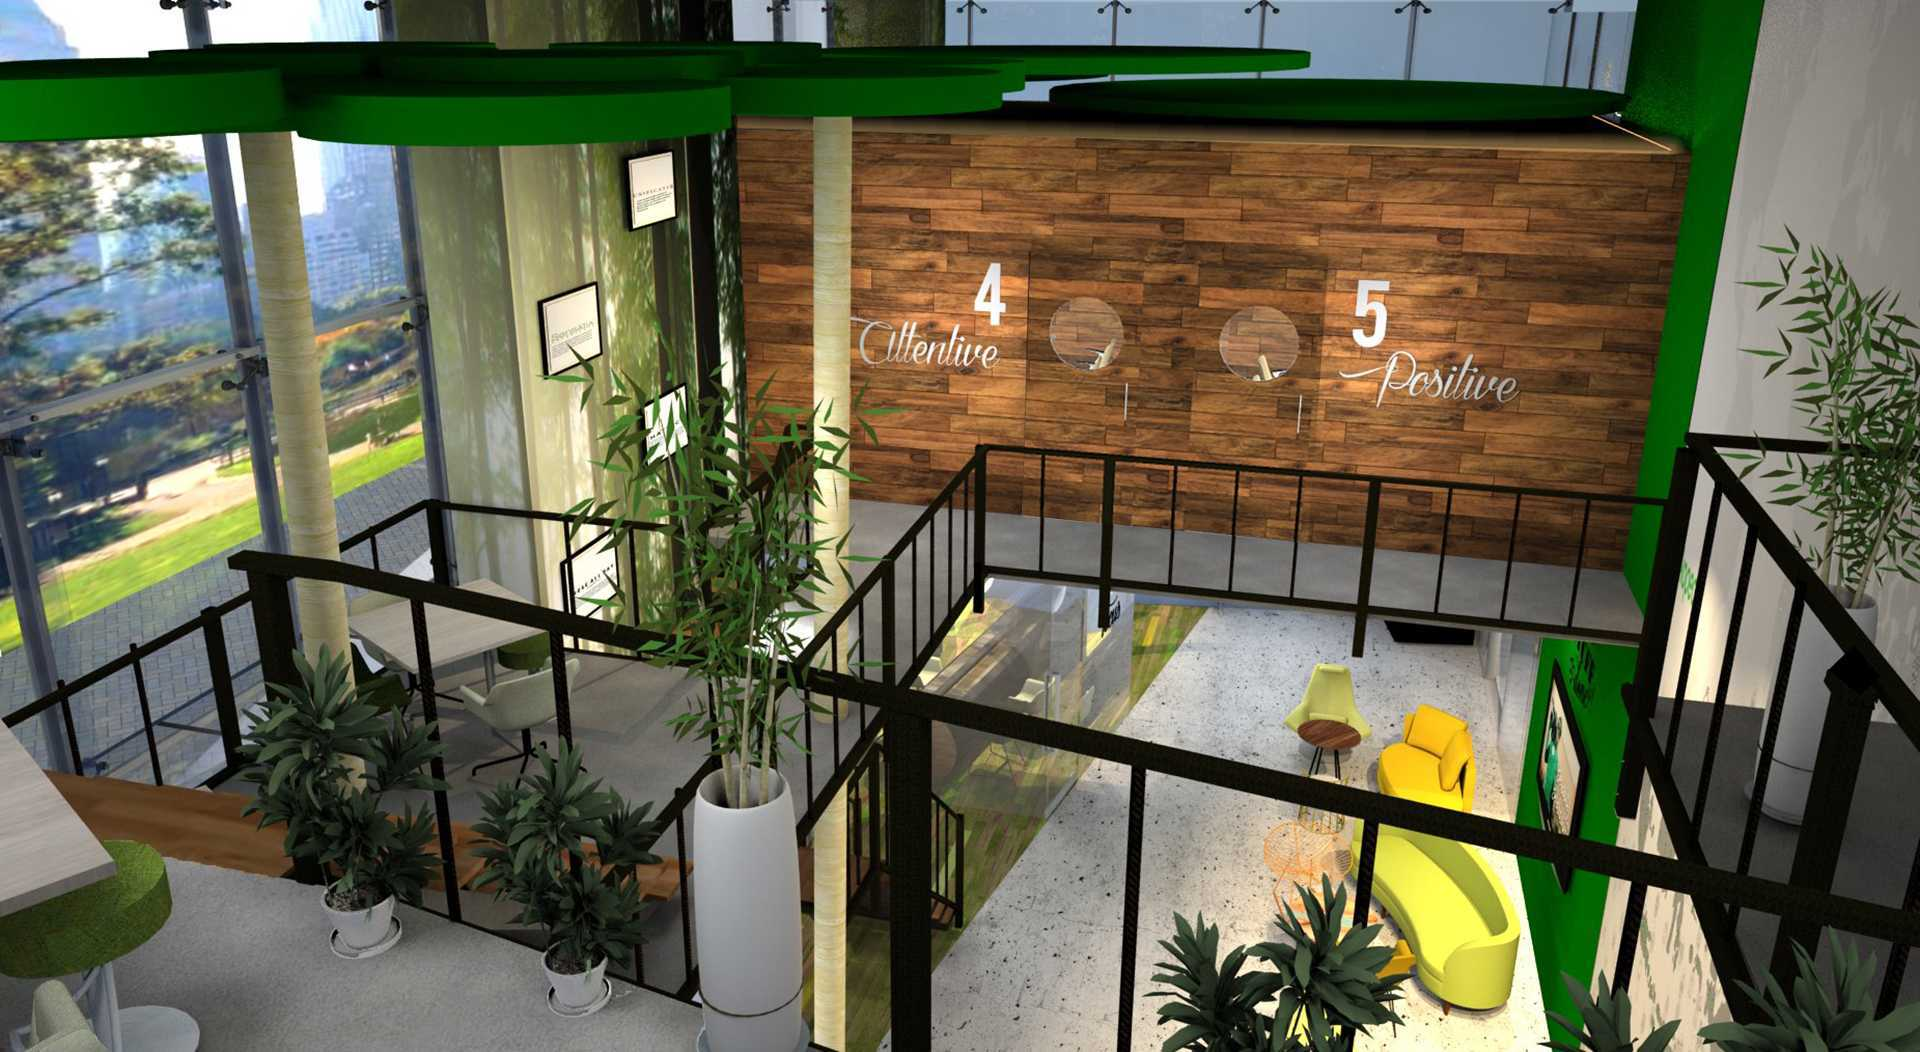 Tms Creative Tokopedia Care Office Jl. Lkr. Luar Bar., Kota Jakarta Barat, Daerah Khusus Ibukota Jakarta, Indonesia  Tms-Creative-Tokopedia-Care-Office Modern 56640